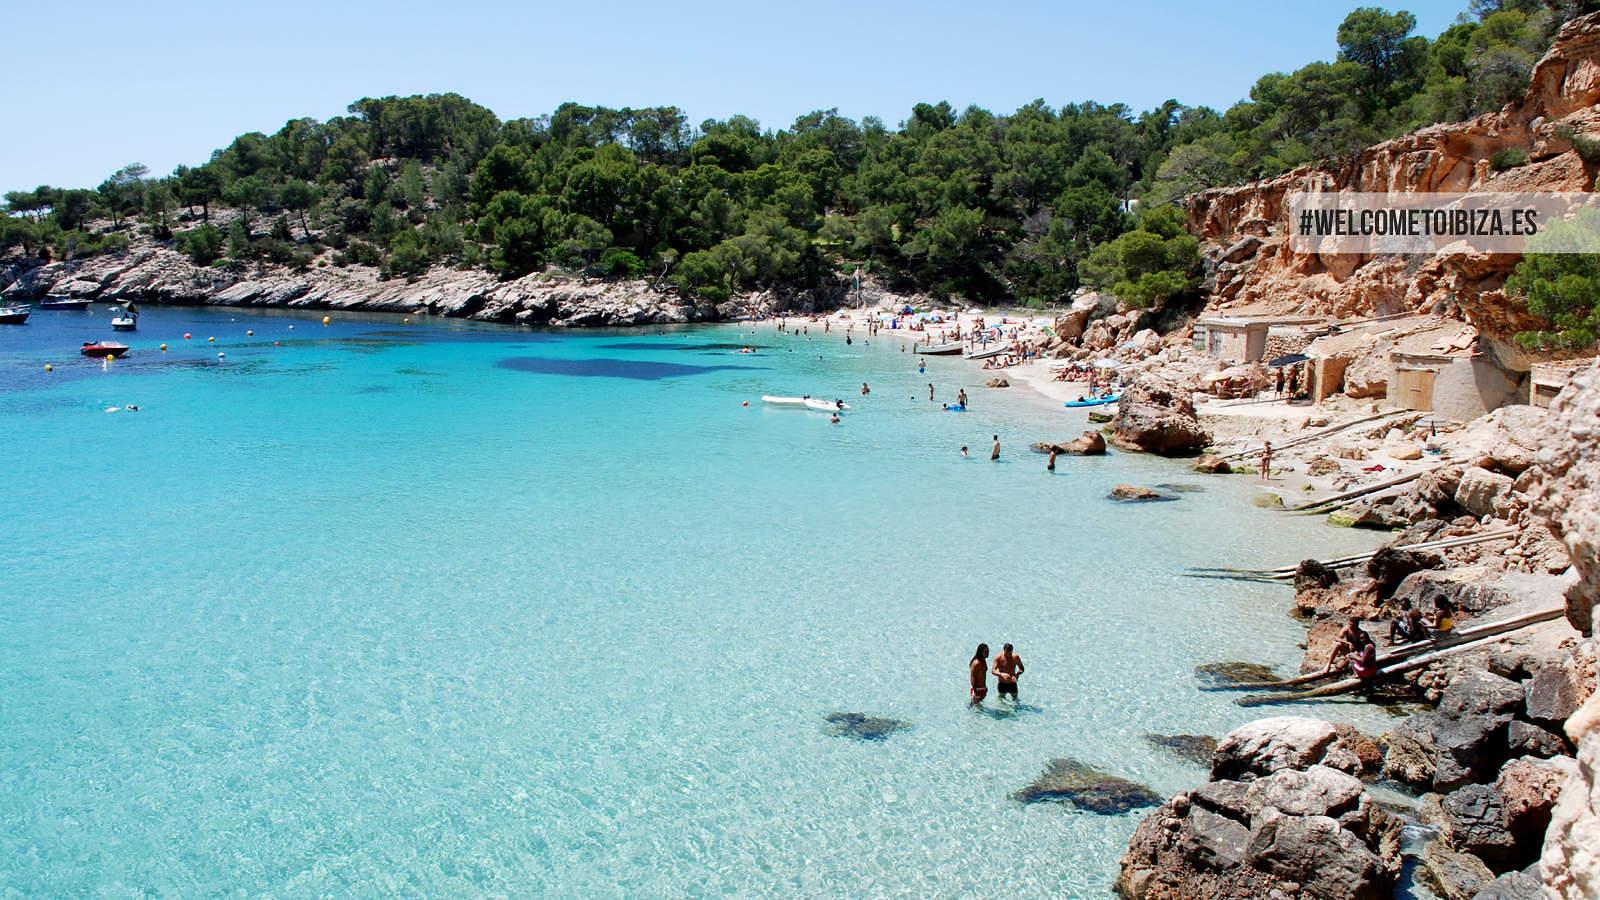 Playa Cala Salada Strand San Antonio Ibiza 2015-9